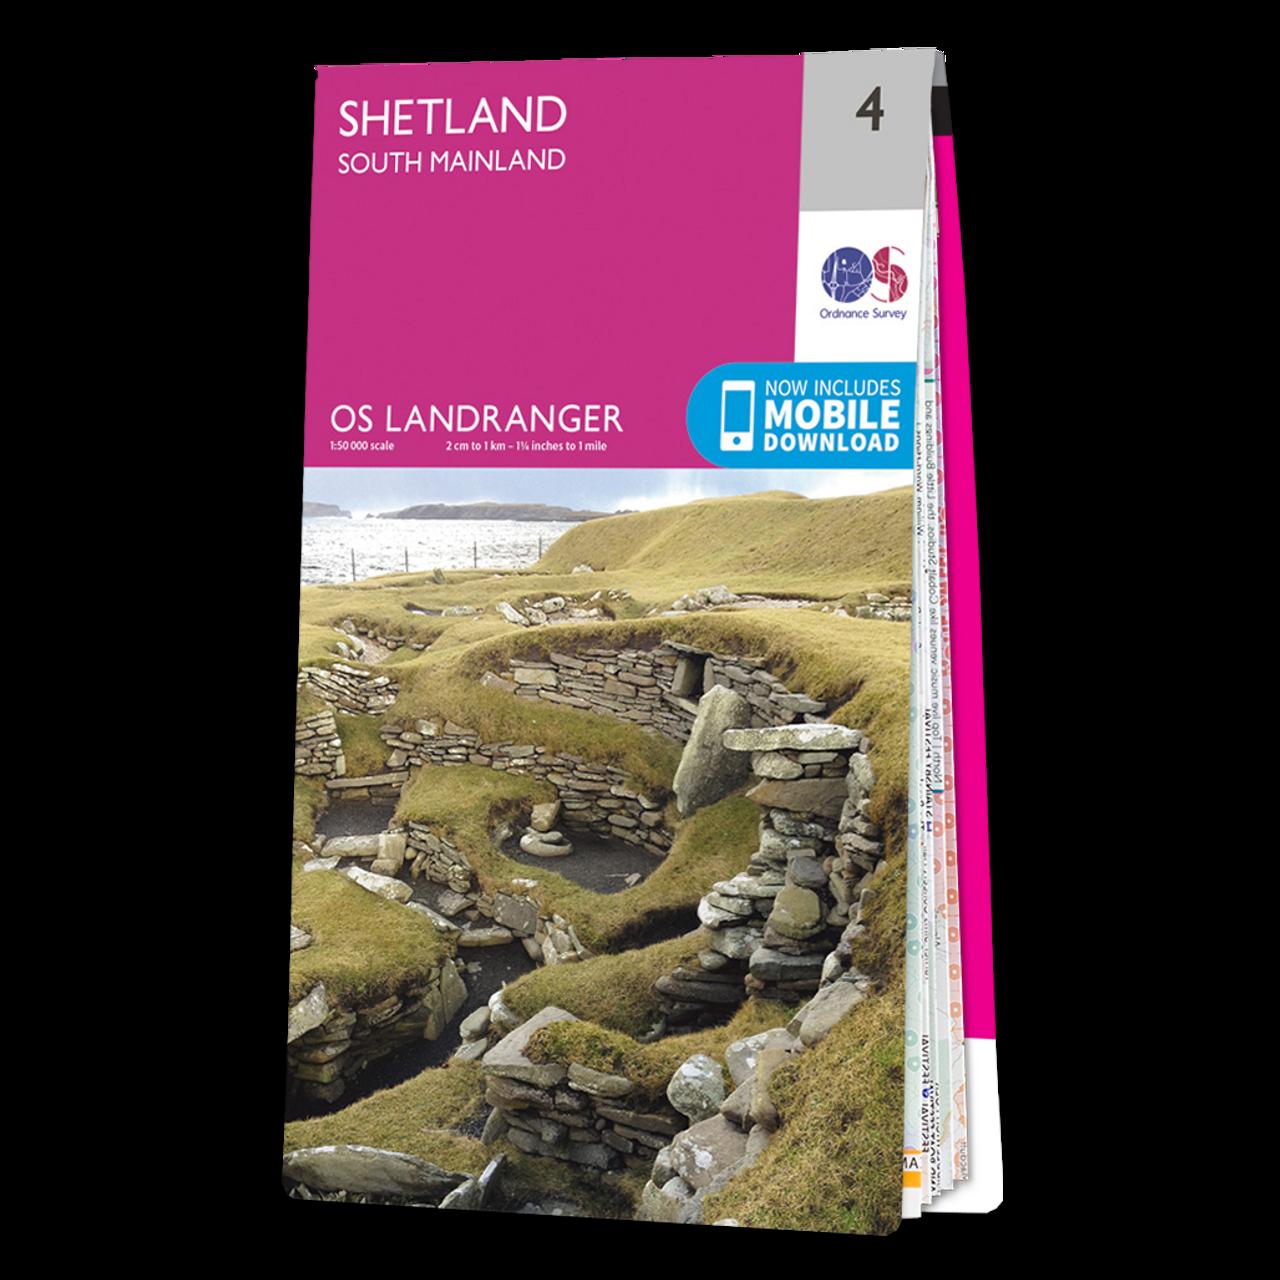 Map Of Shetland - South Mainland